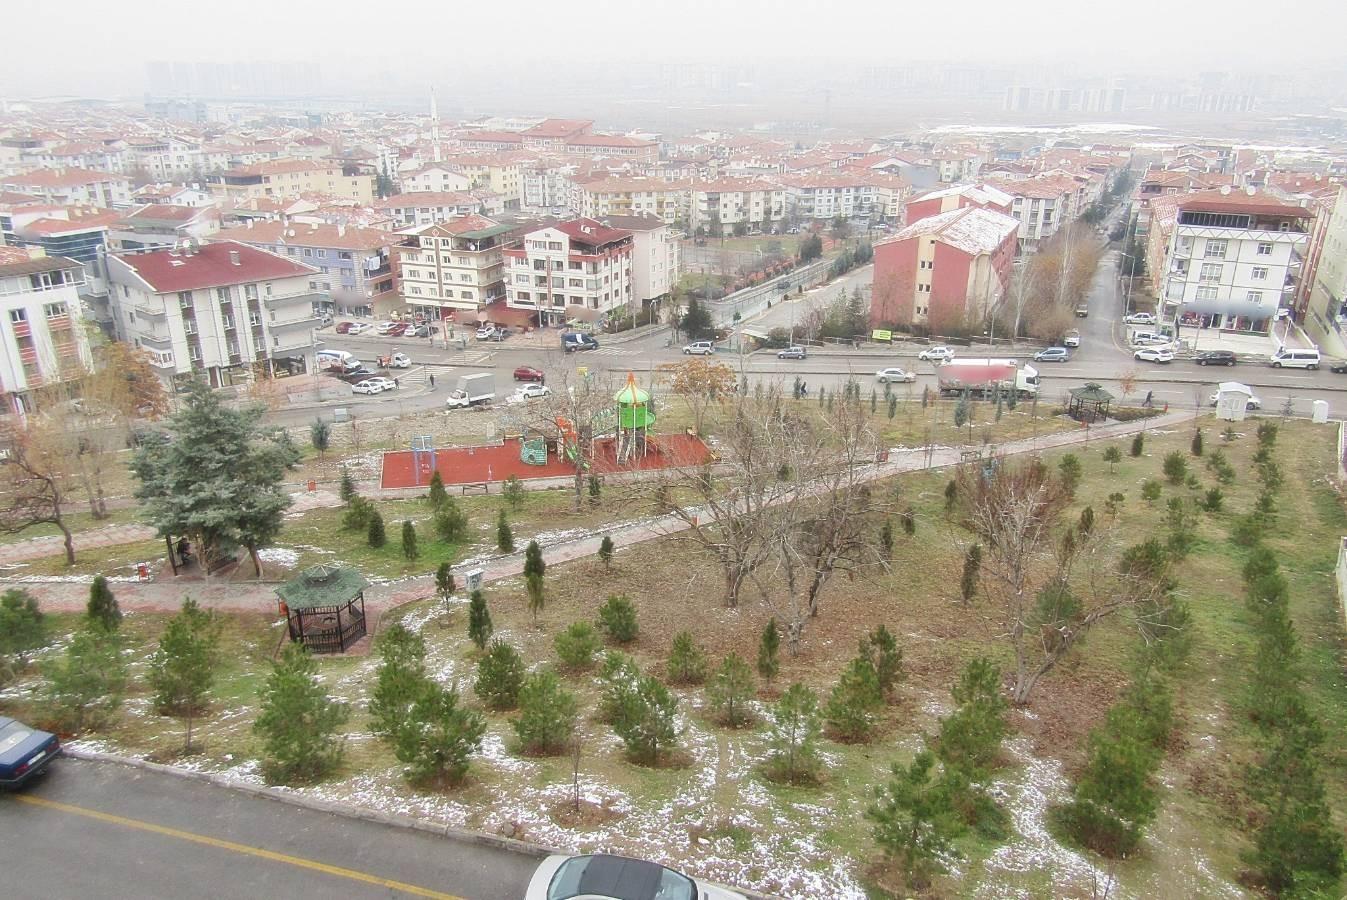 SR EMLAK'TAN SÜVARİ MAH'DE 5+2  250m² TRENE YAKIN YAPILI TERAS DAİRE